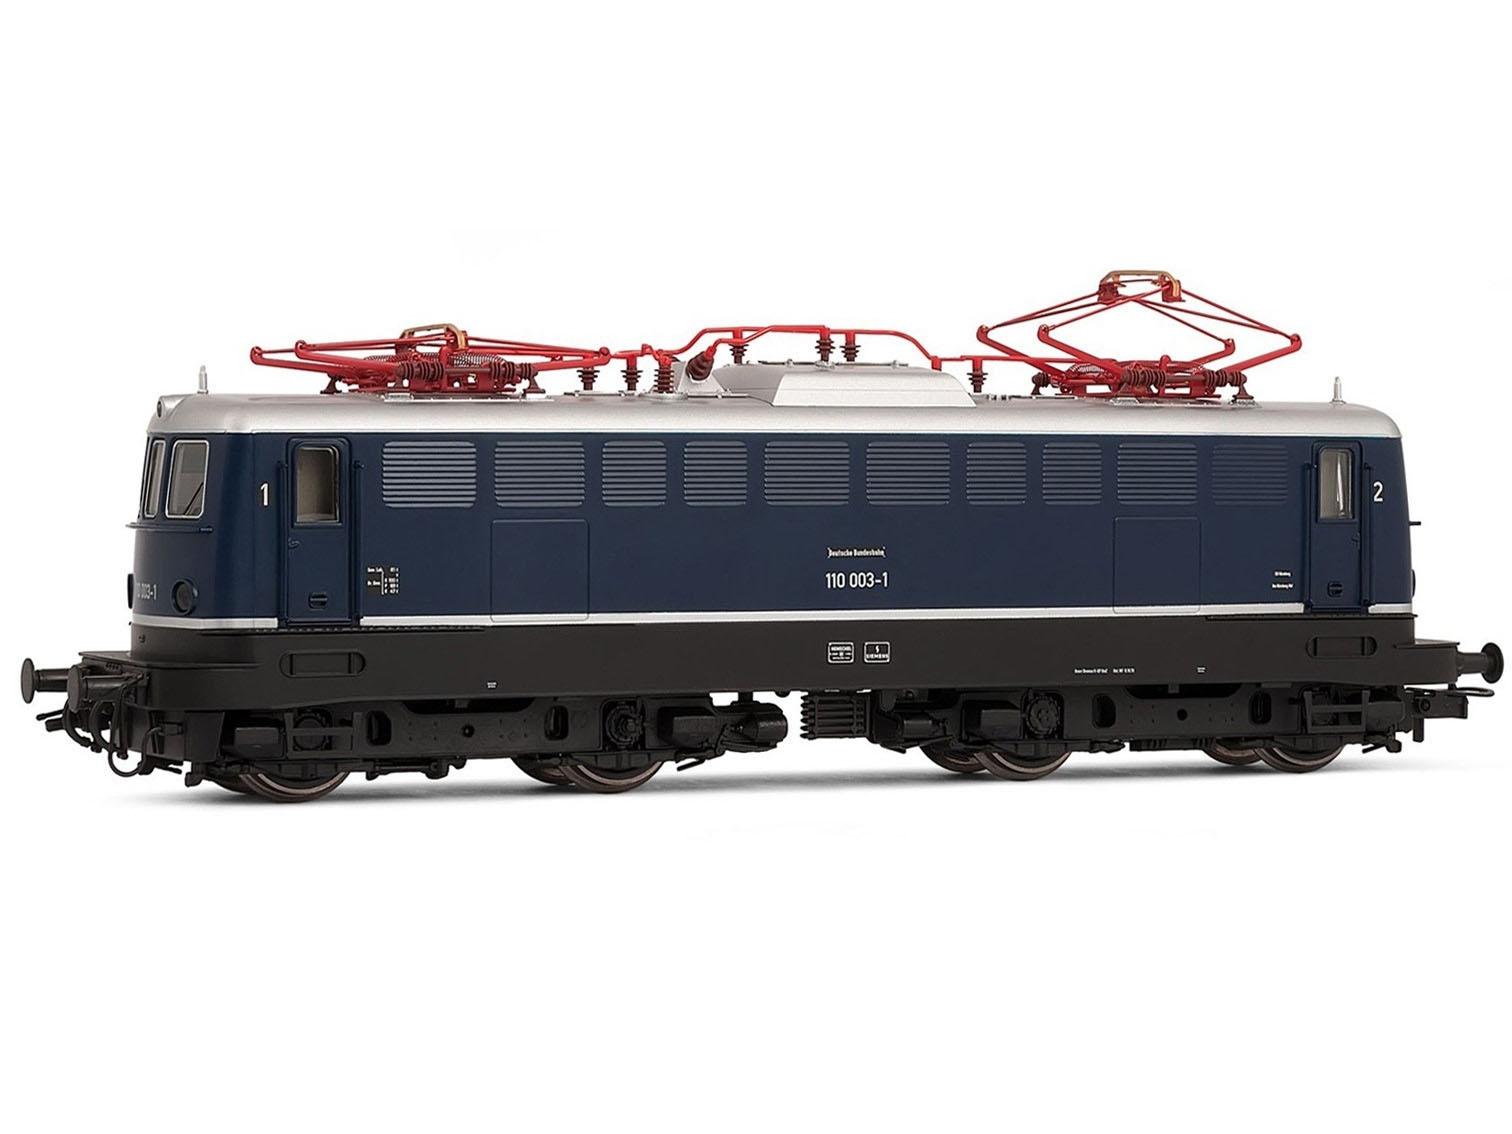 "nach 7 Stunden alle weg... Modellbahn Ellok Rivarossi HR2312 Elektrolok BR 110 (Vorserie) DB H0 DC bei DM Toys ""recertified"""